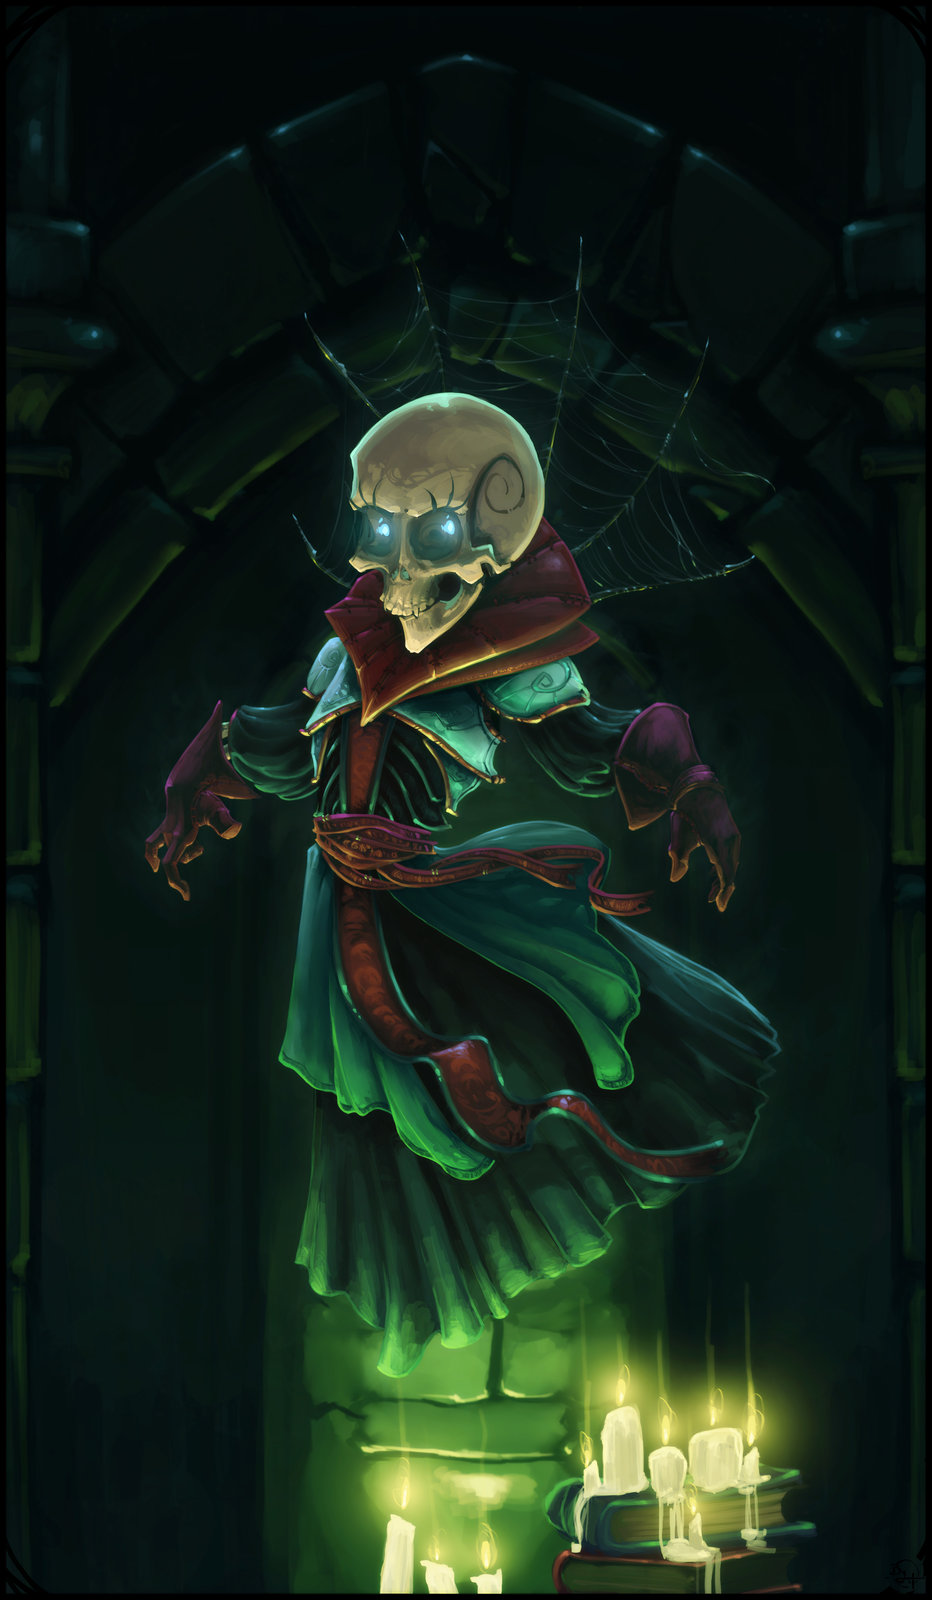 Gamine Squelette